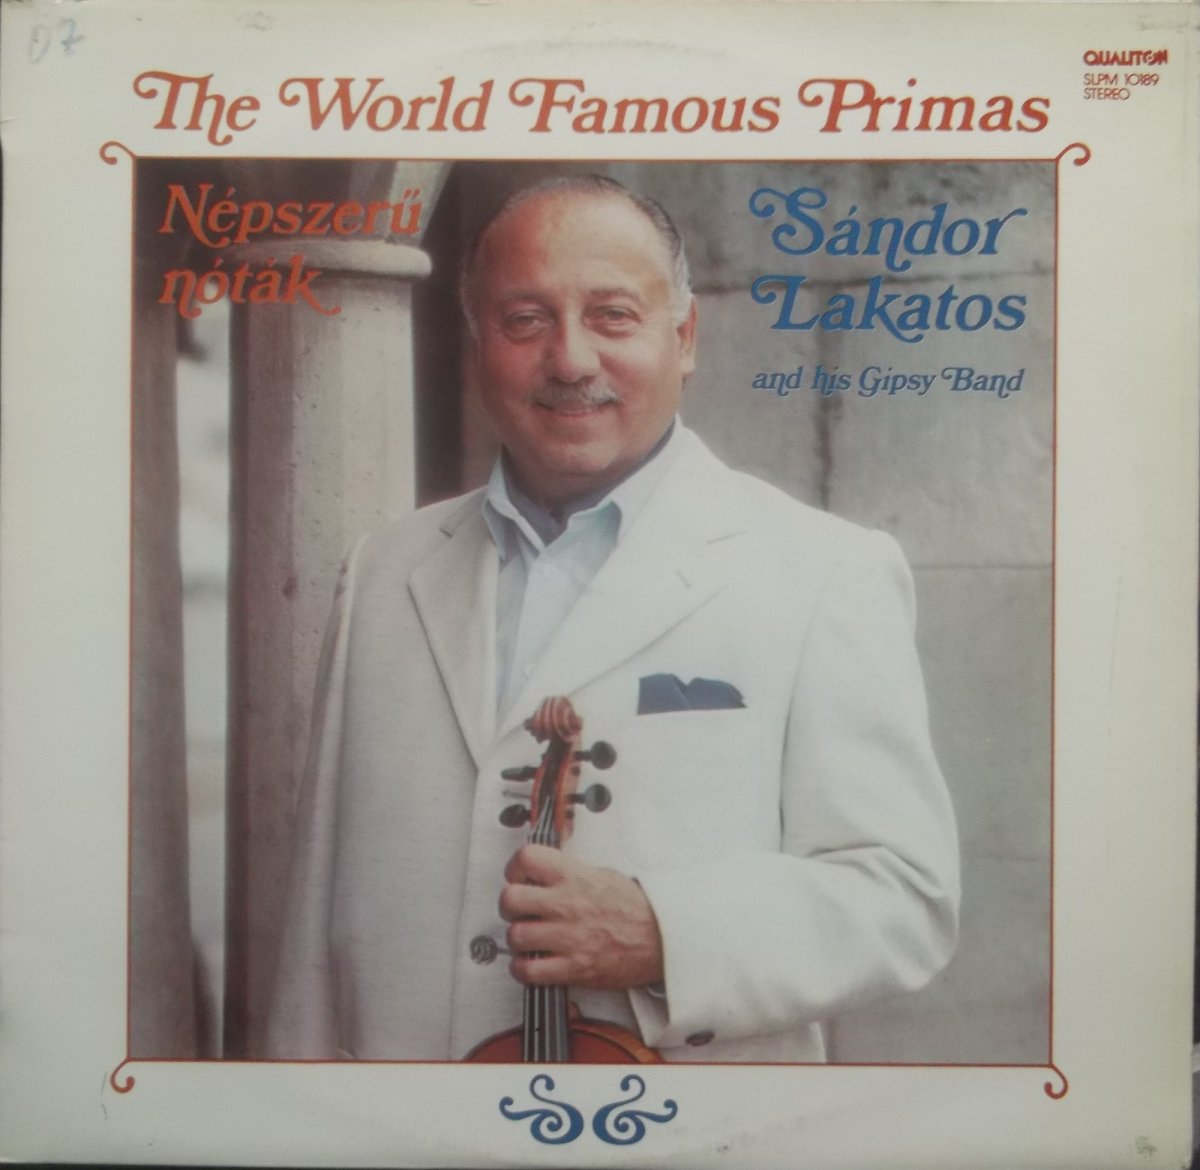 Sándor Lakatos And His Gipsy Band – The World Famous Primas